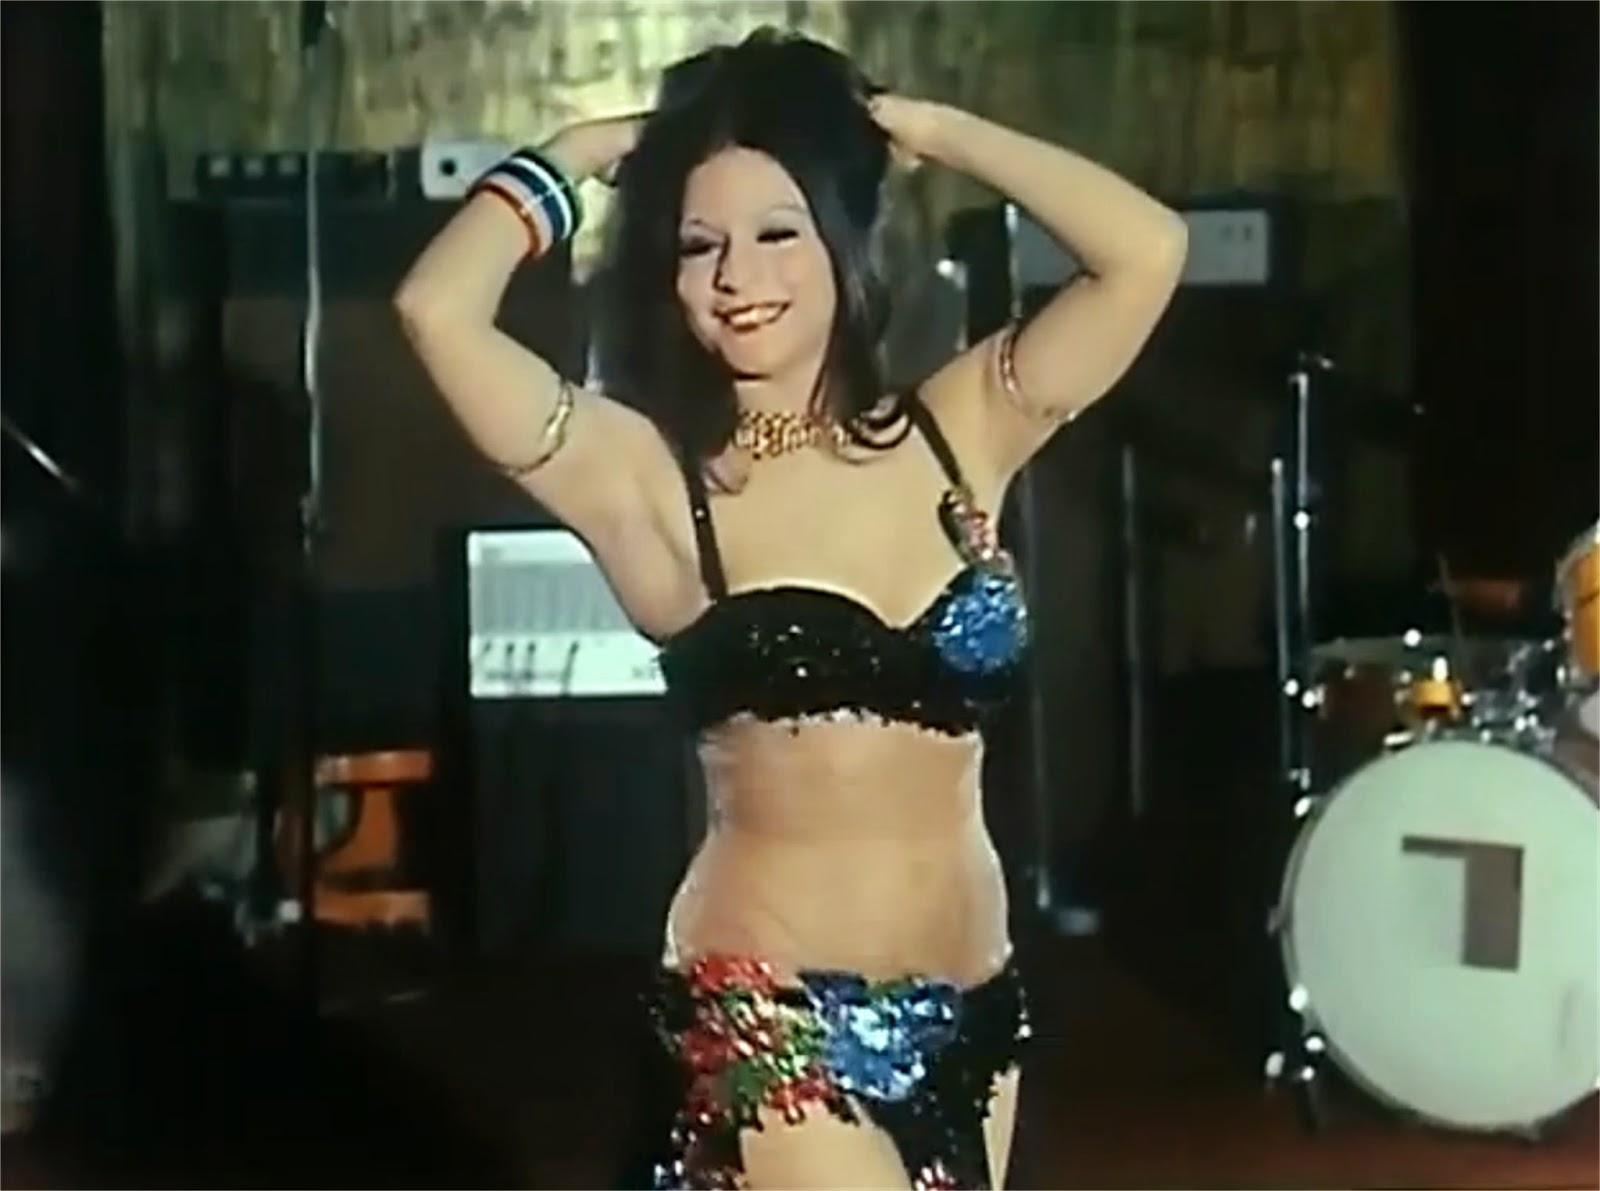 Egyptian Dancer Souher Zaki